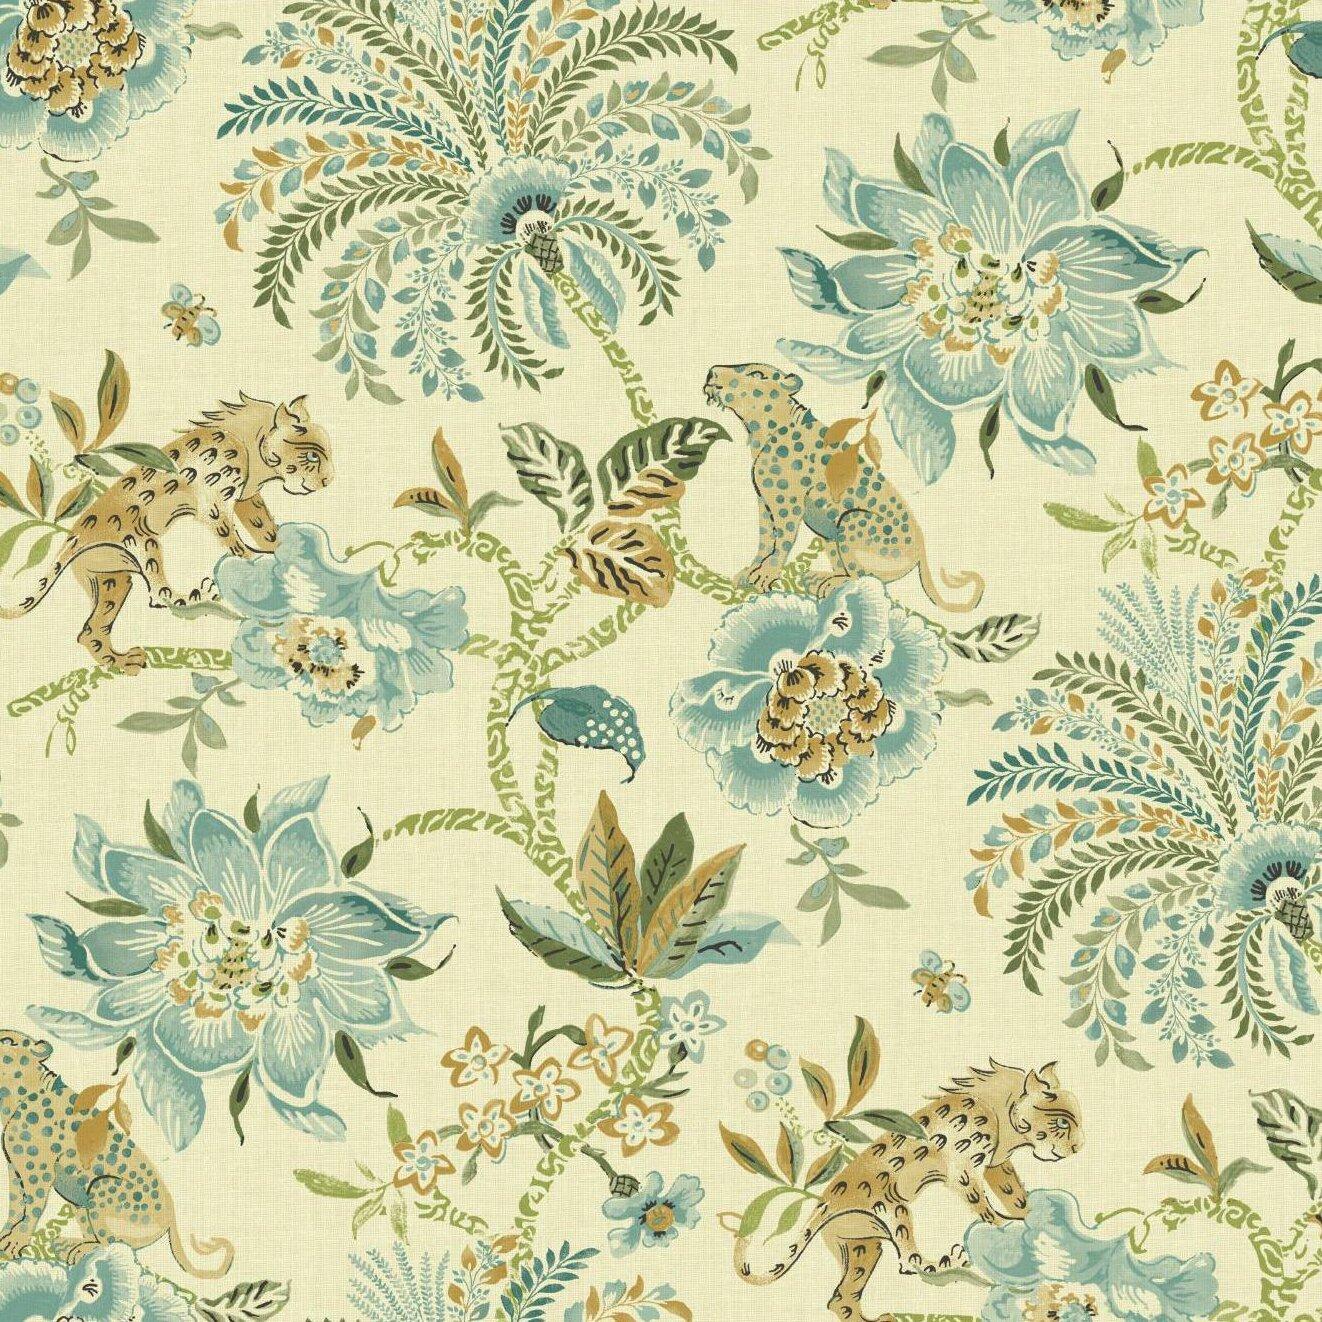 York Wallcoverings Williamsburg II 27 X Braganza Flower Texture Wallpaper Reviews